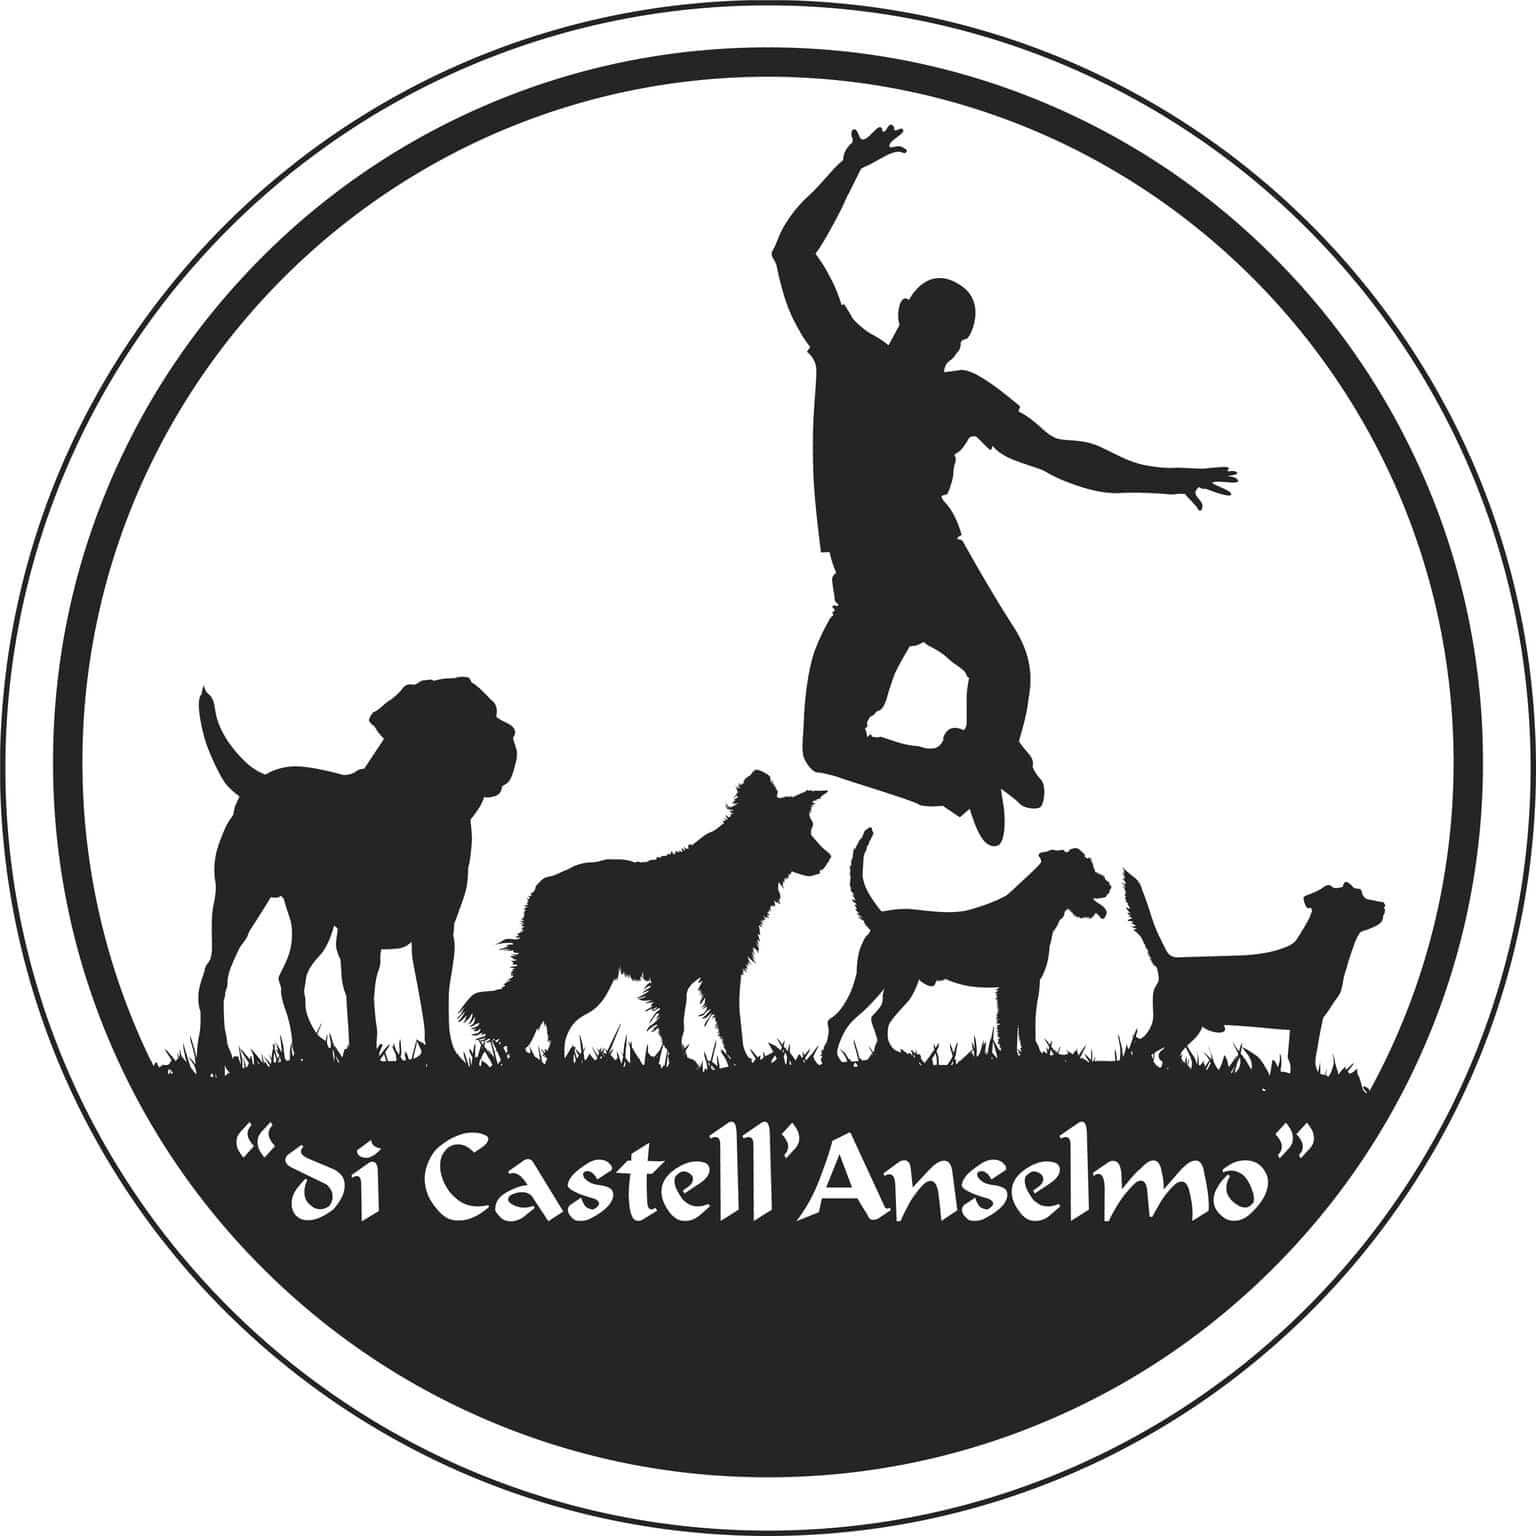 DI CASTELL'ANSELMO